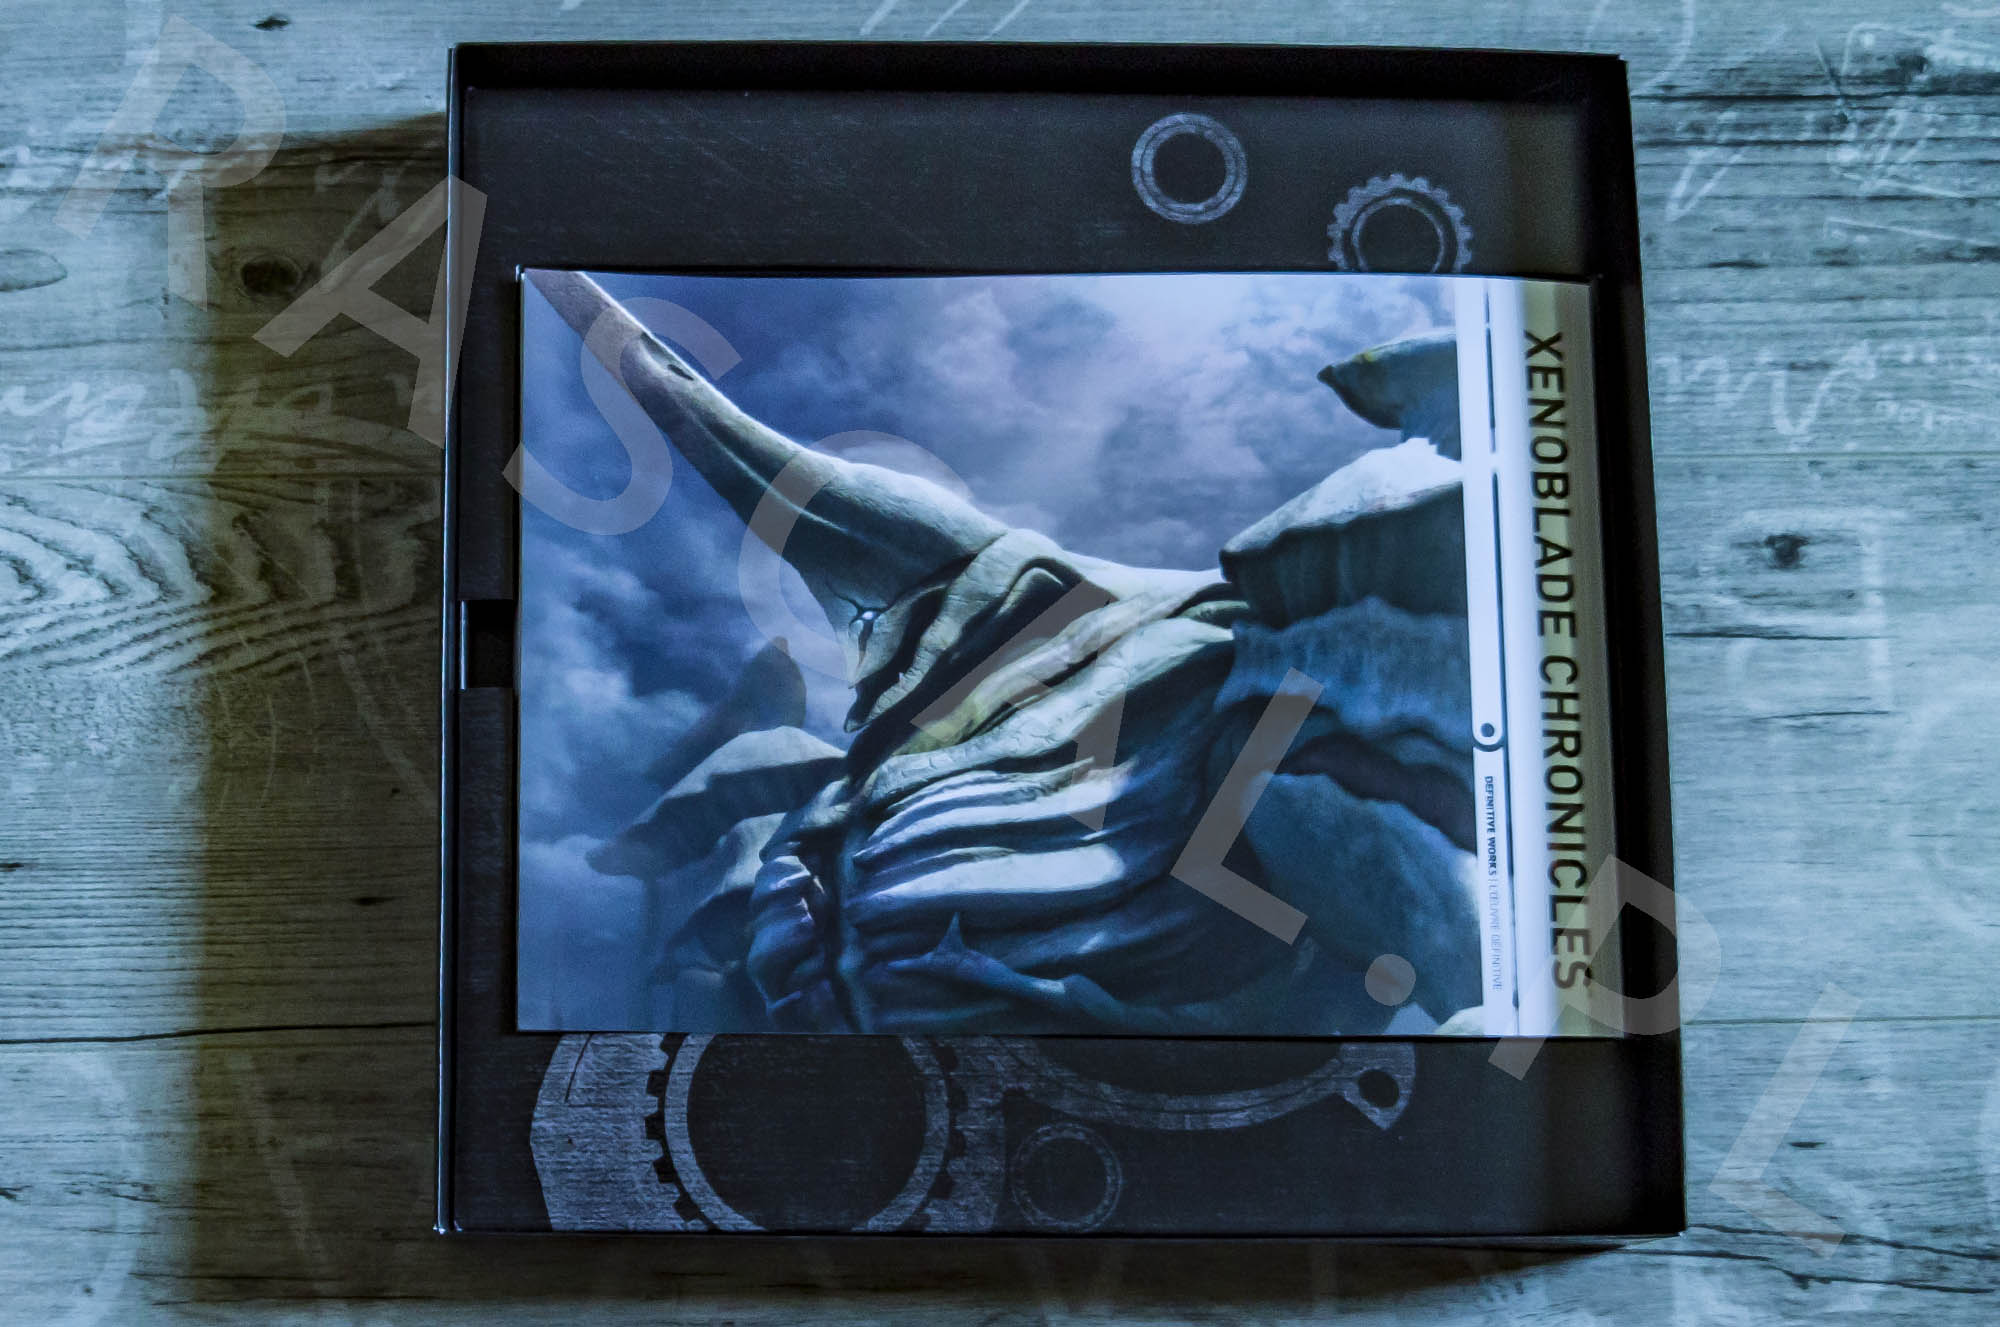 Xenoblade Chronicles Definitive Edition Collectors Set - Artbook - 31 - Tył